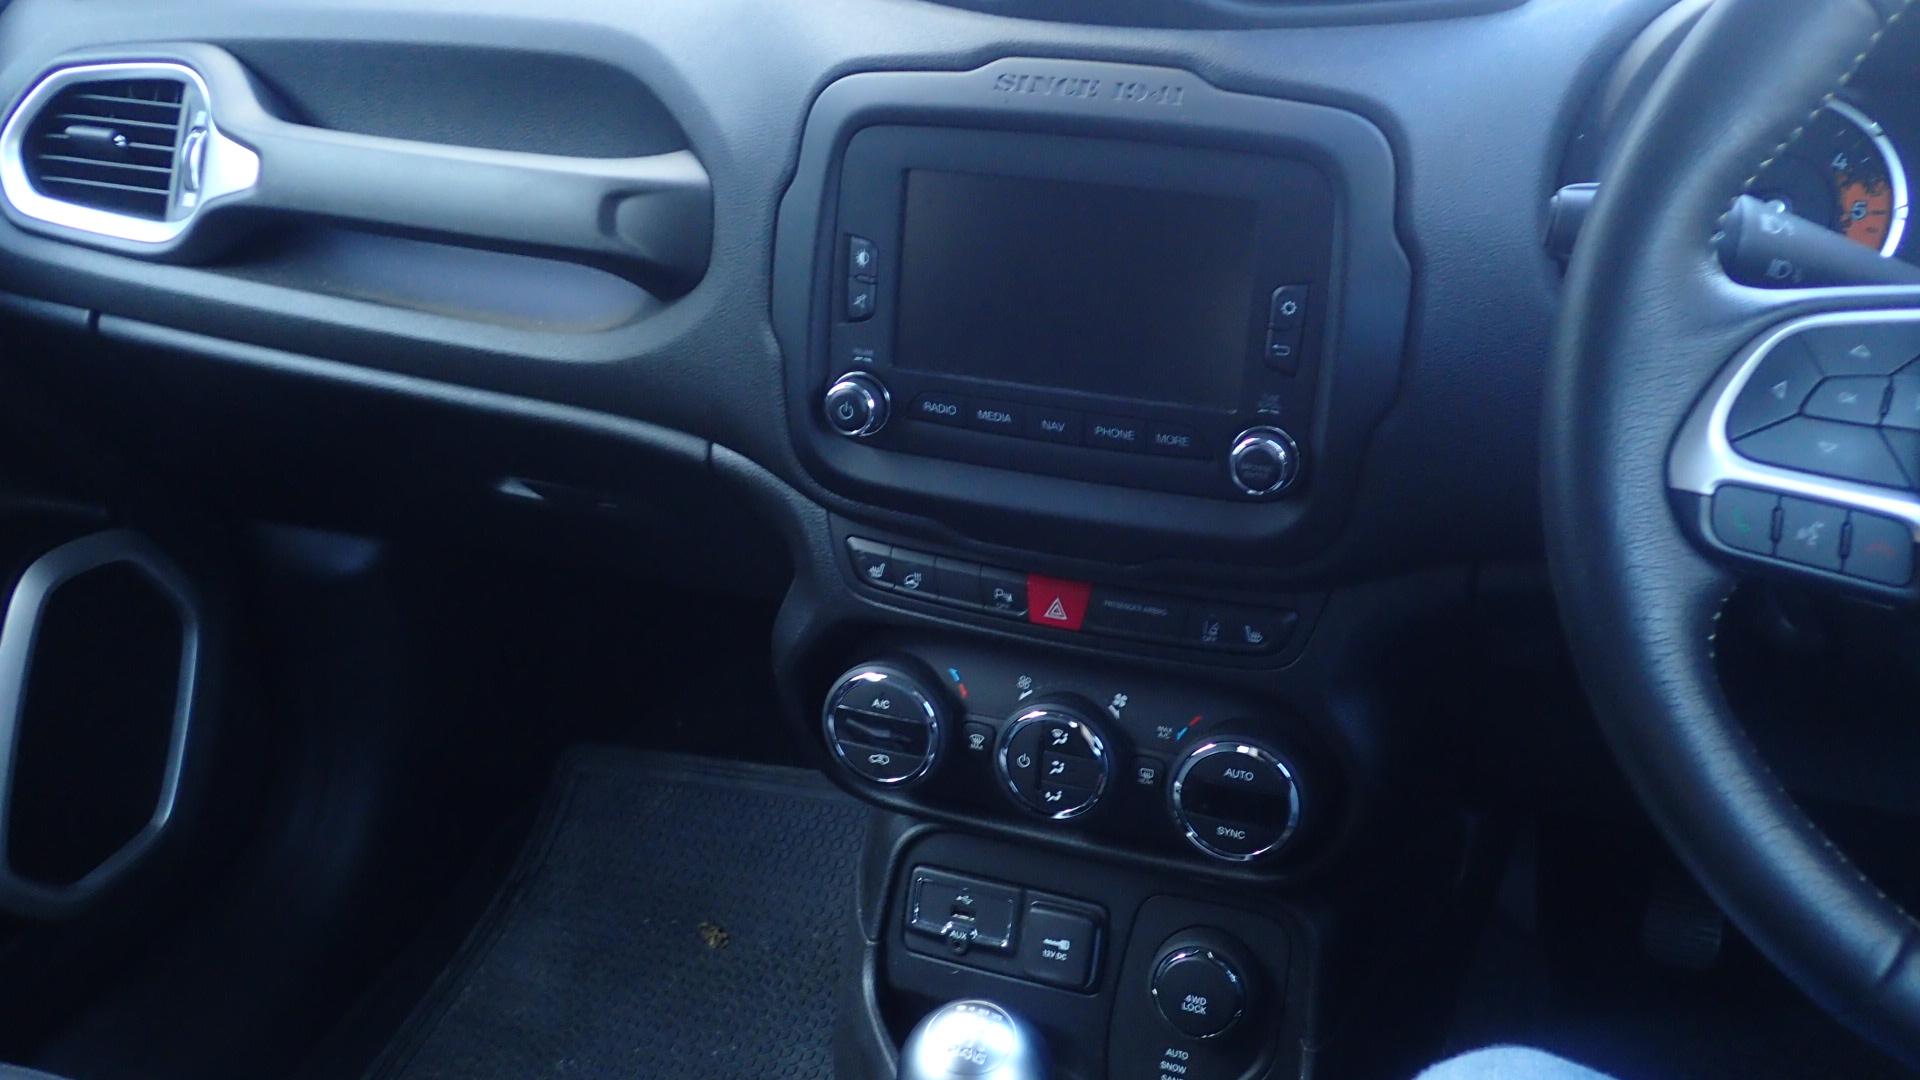 Lot 1200 - Jeep Renegade diesel hatchback 2.